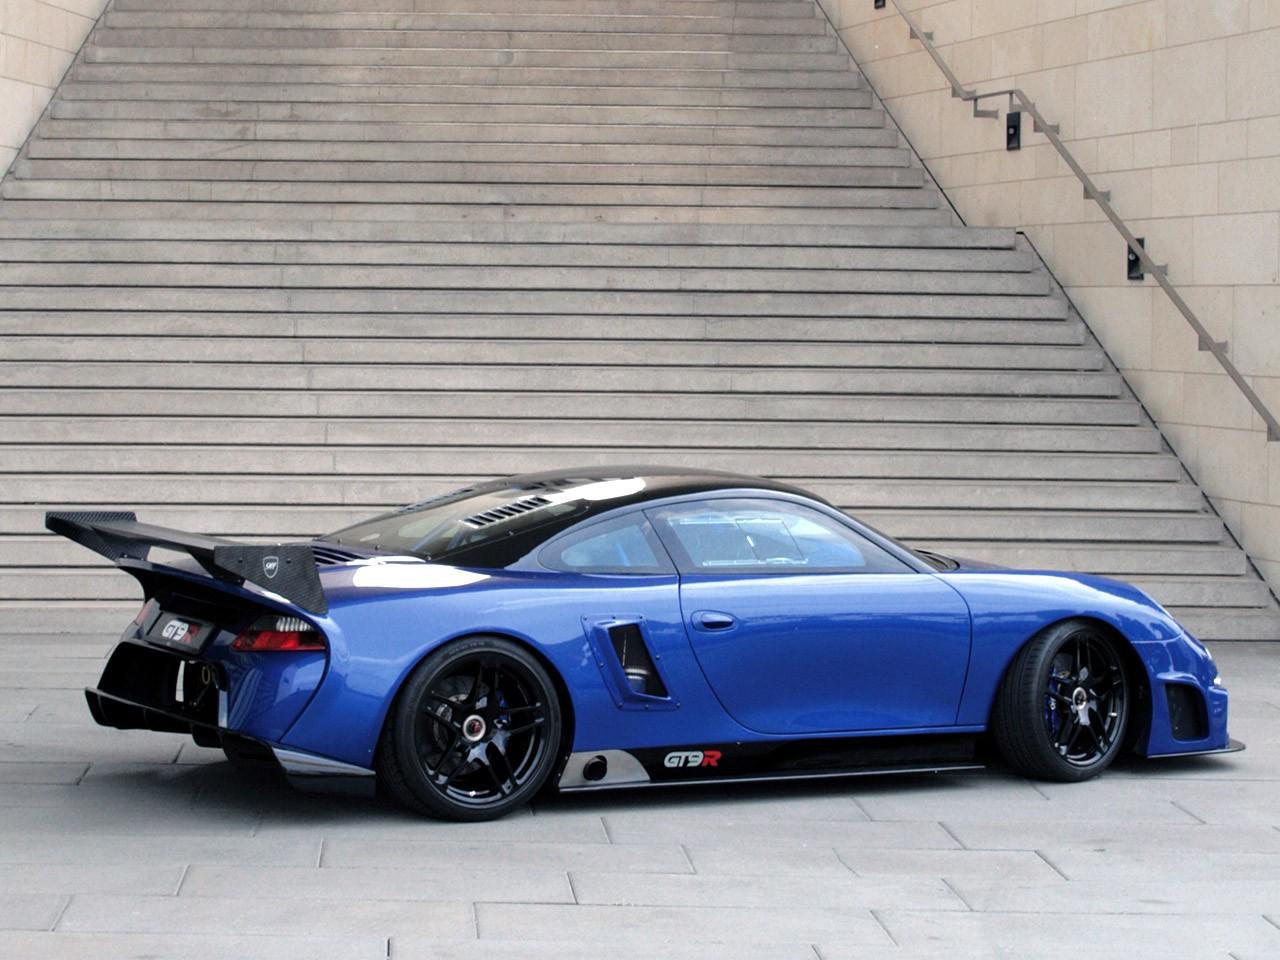 2009 9ff Porsche GT9 R